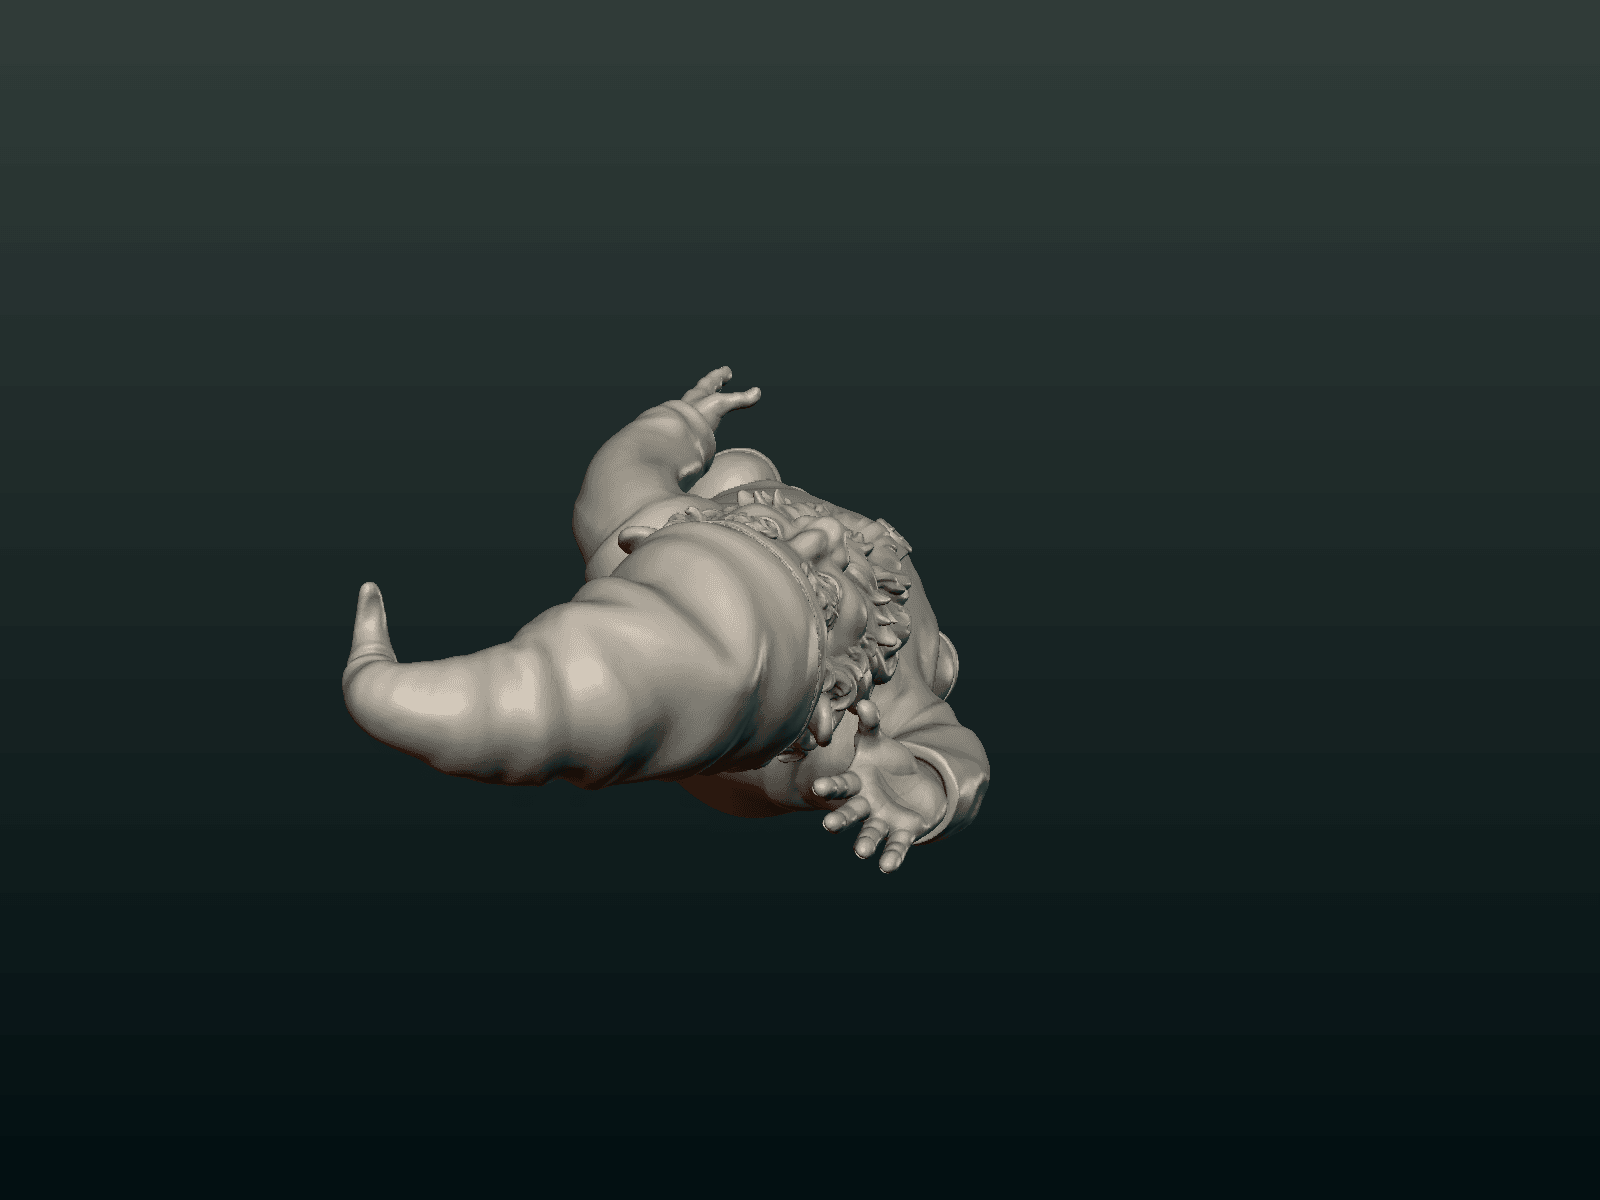 Garden_Gnome-08.png Download STL file Garden Gnome • 3D printing design, Skazok